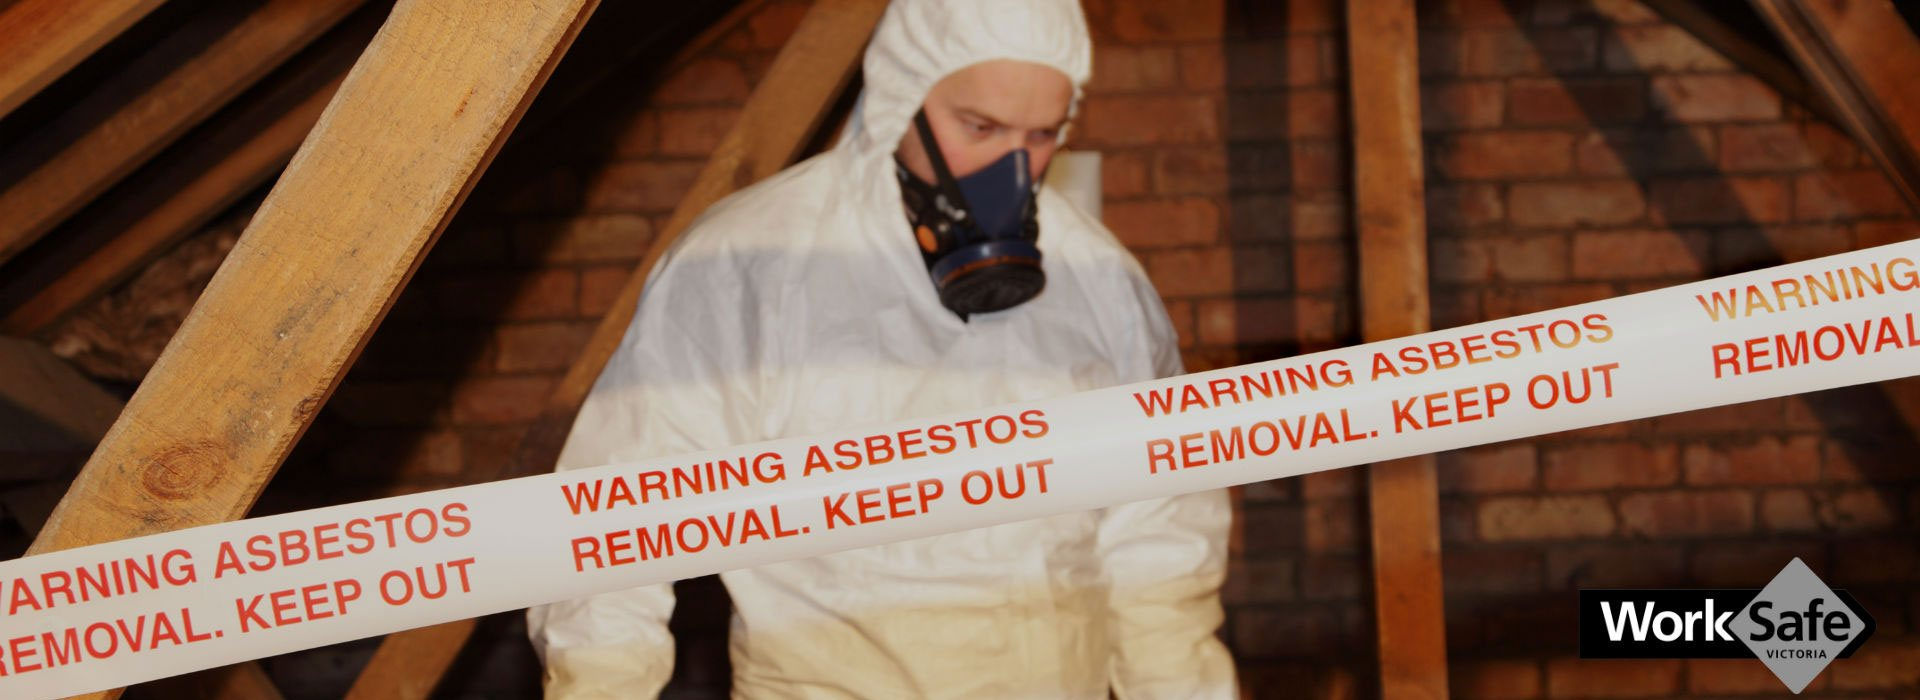 asbestos_removal_melbourne4